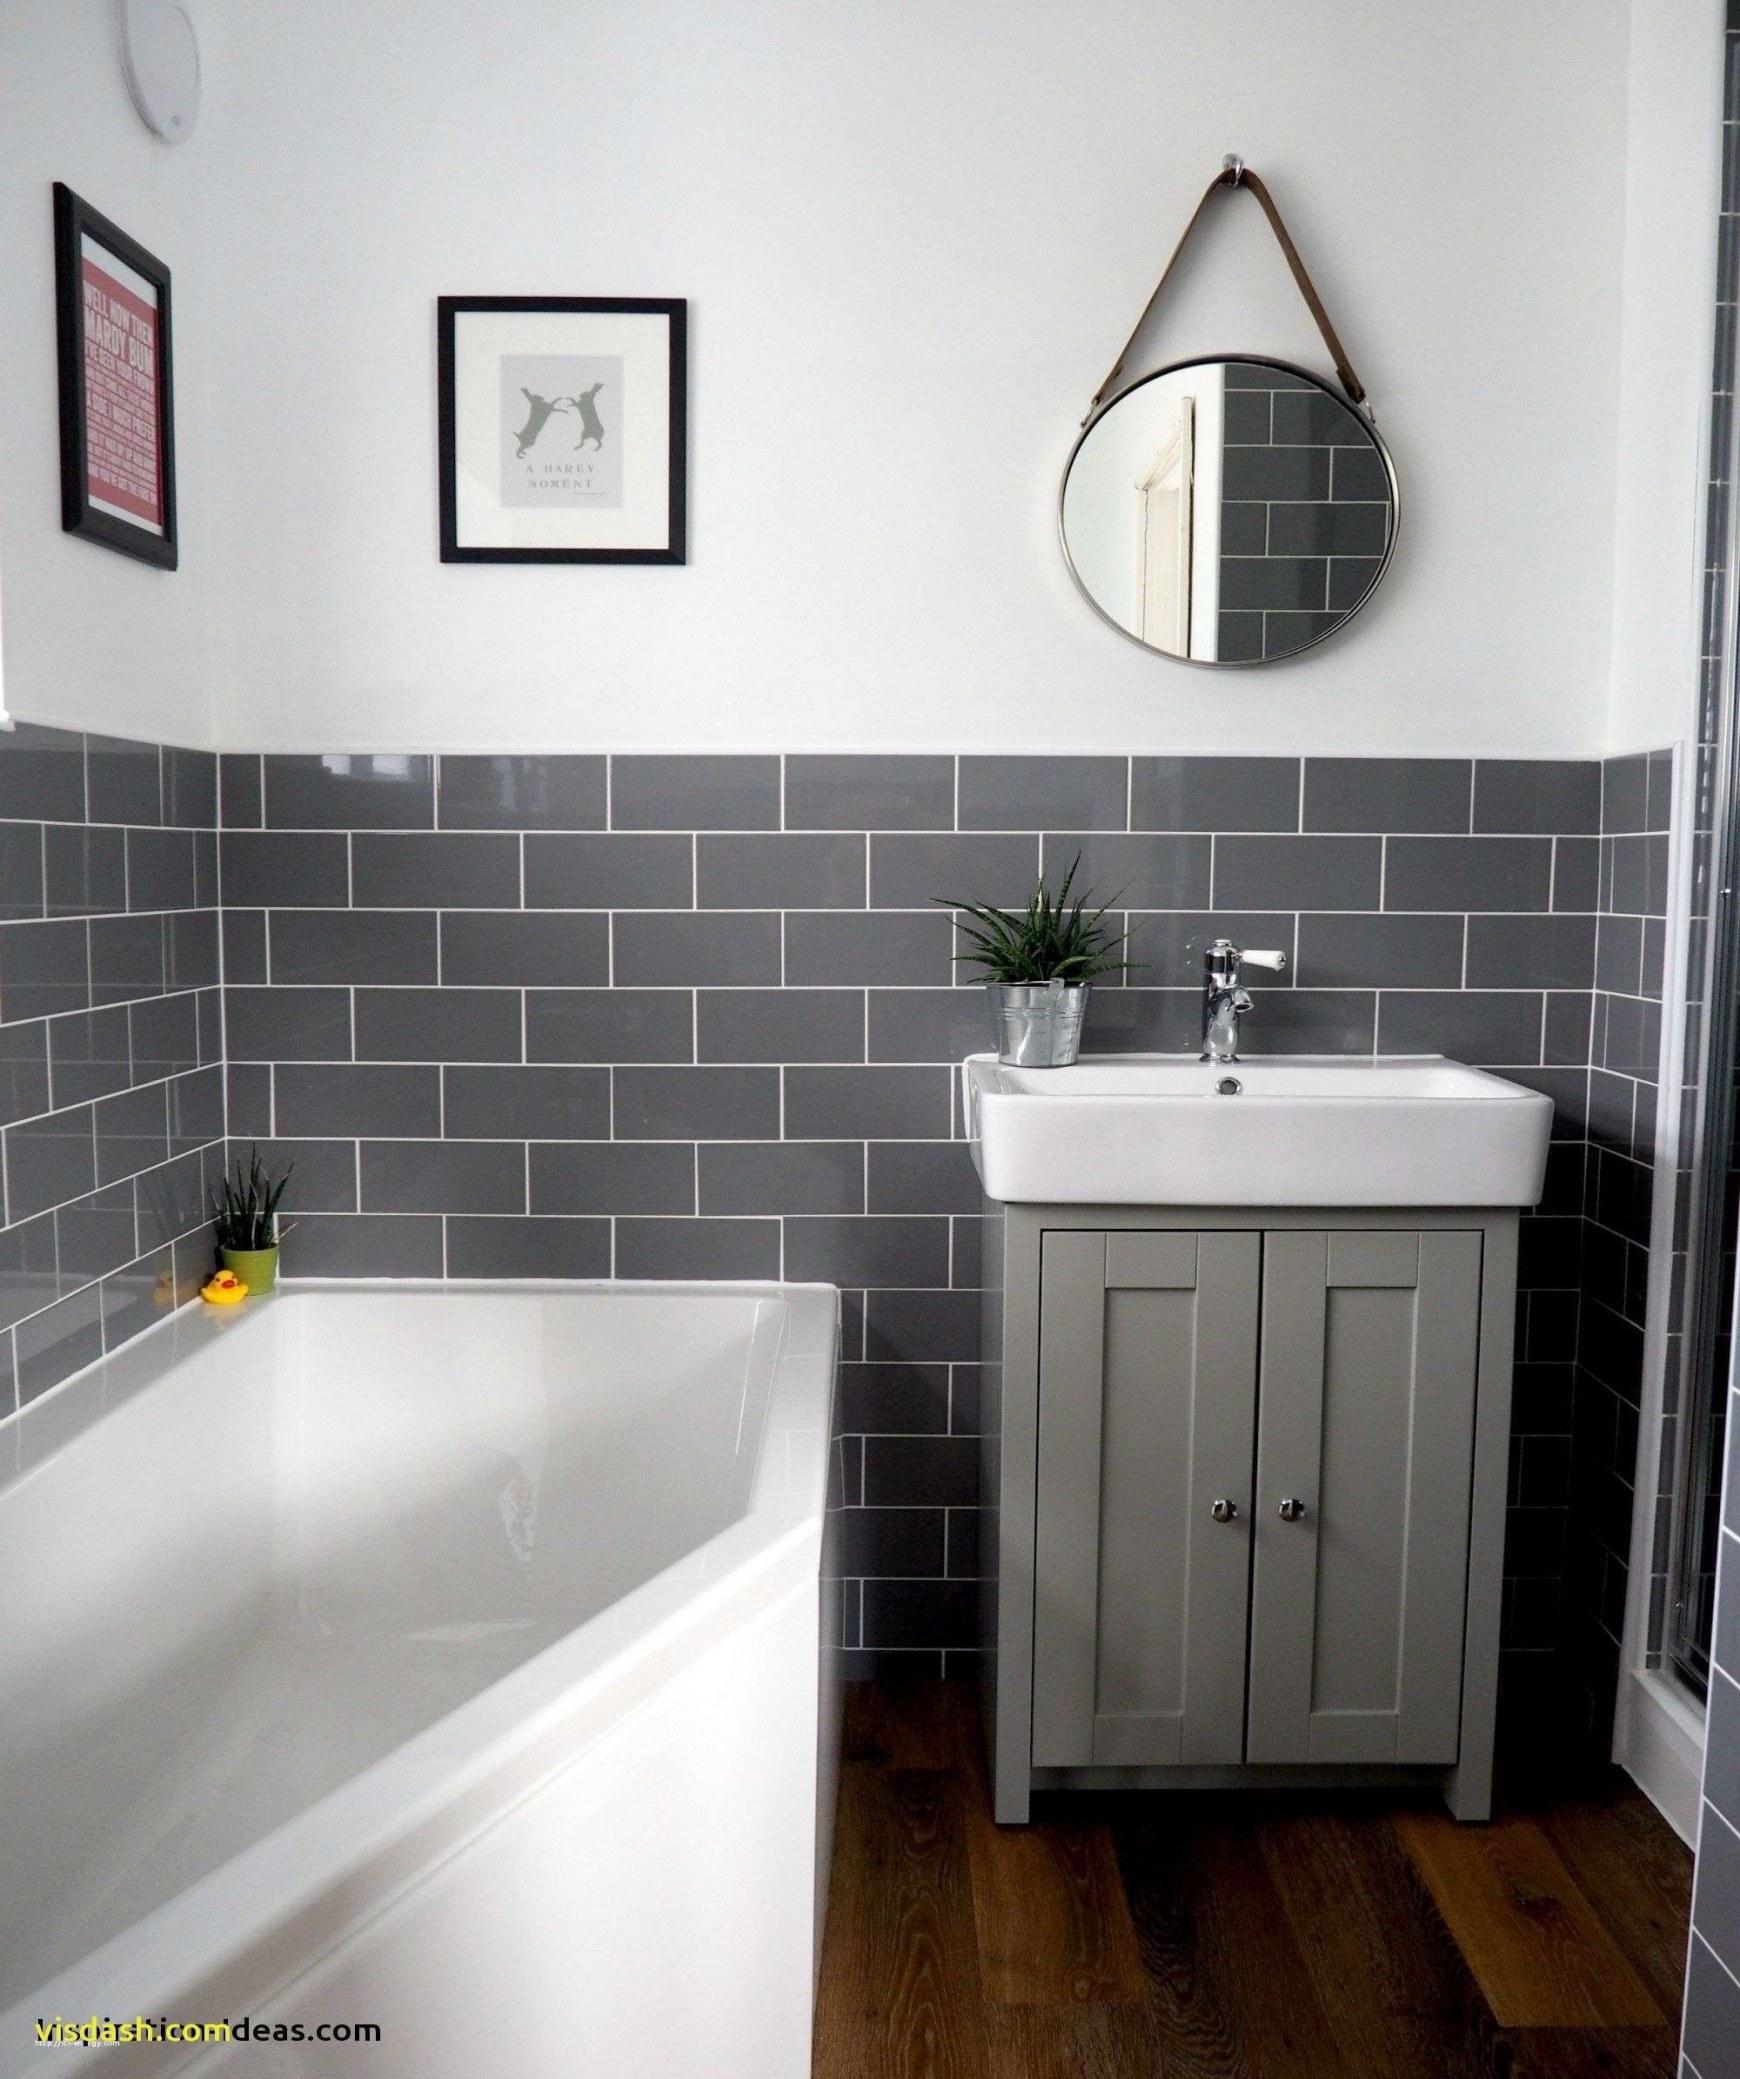 small bathroom design ideas home ideas shower tile ideas astonishing best small of small bathroom design ideas